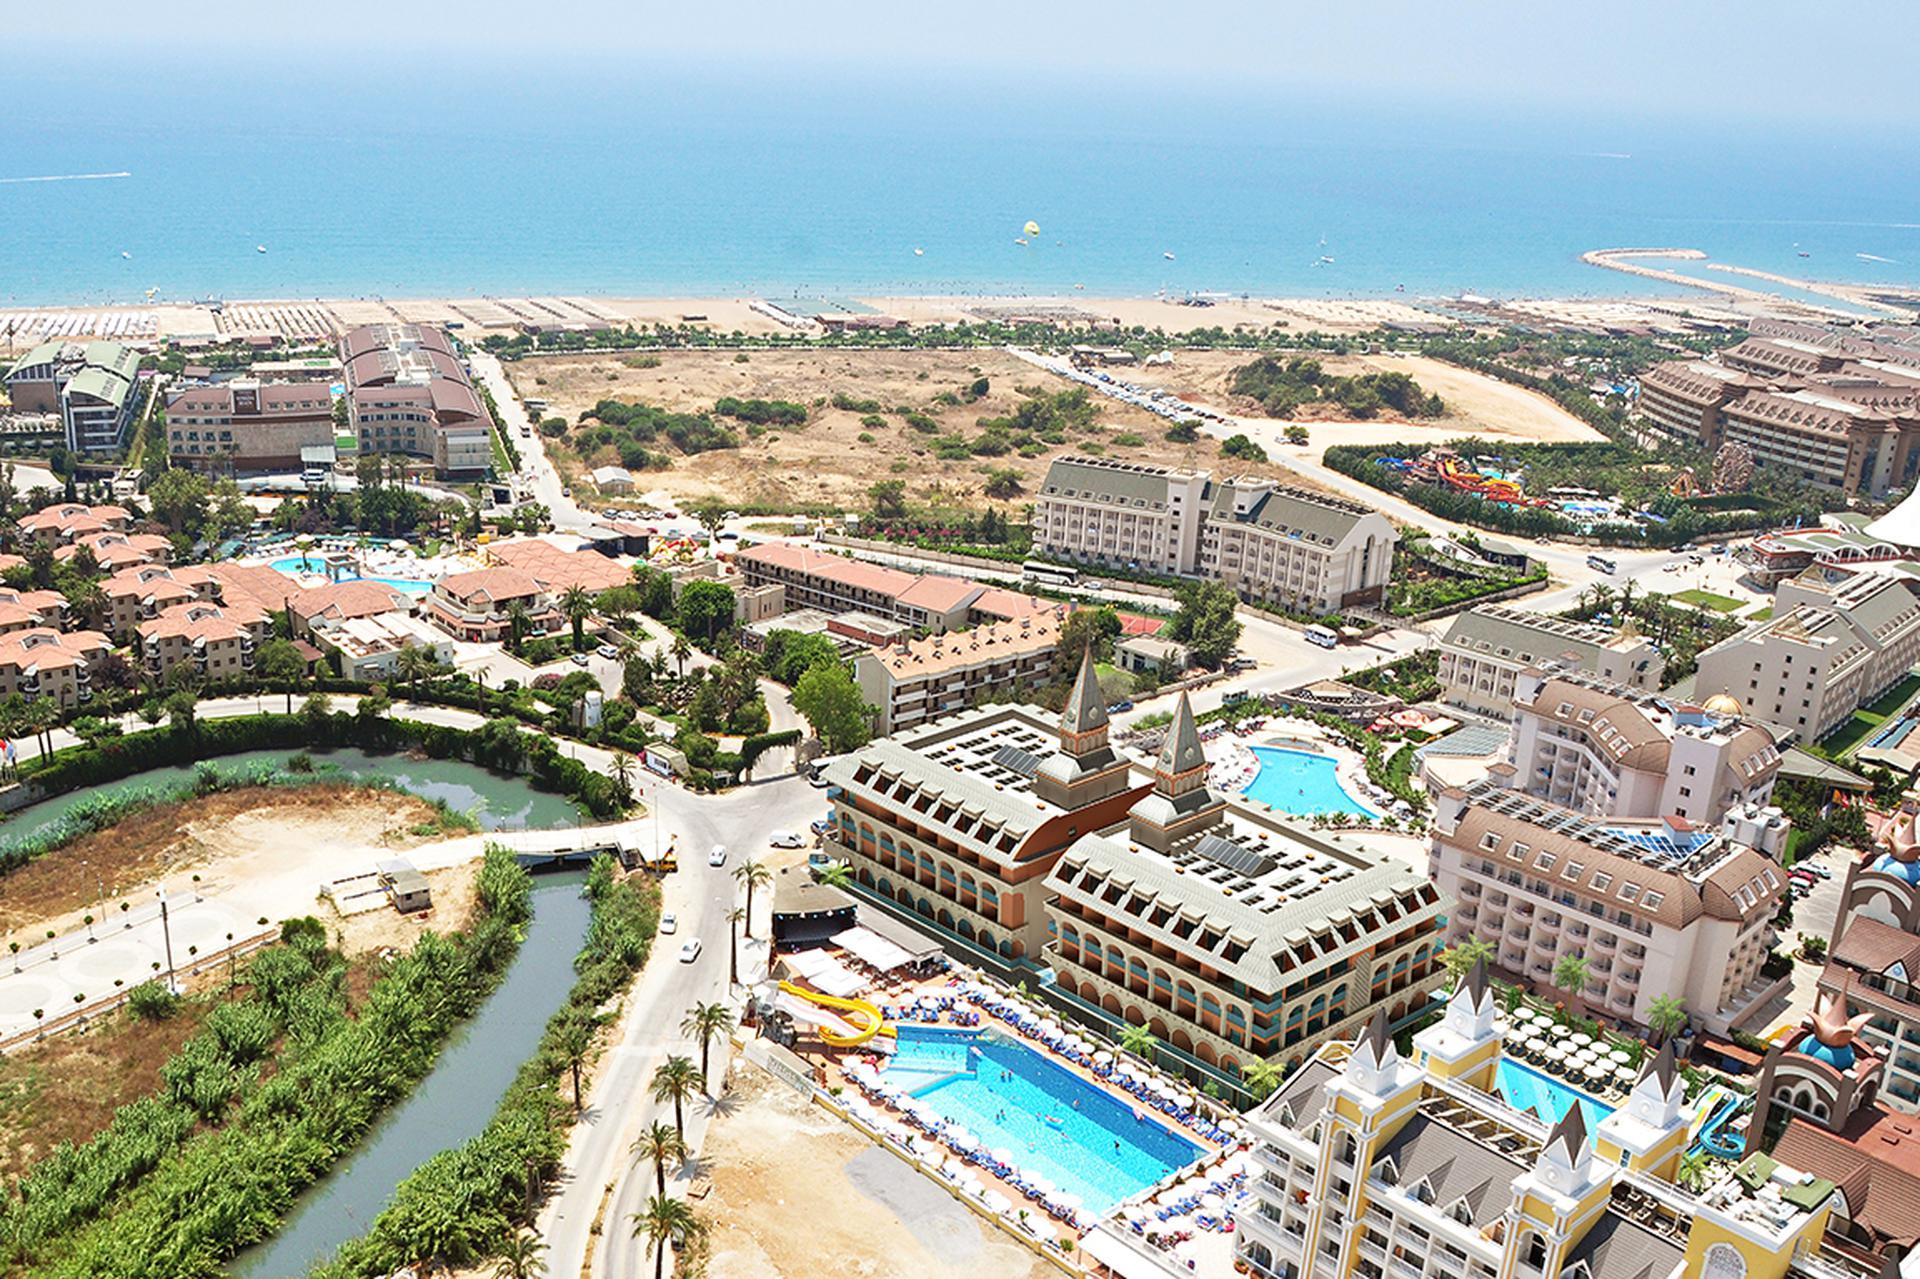 Hotel Orange Palace Diskothek